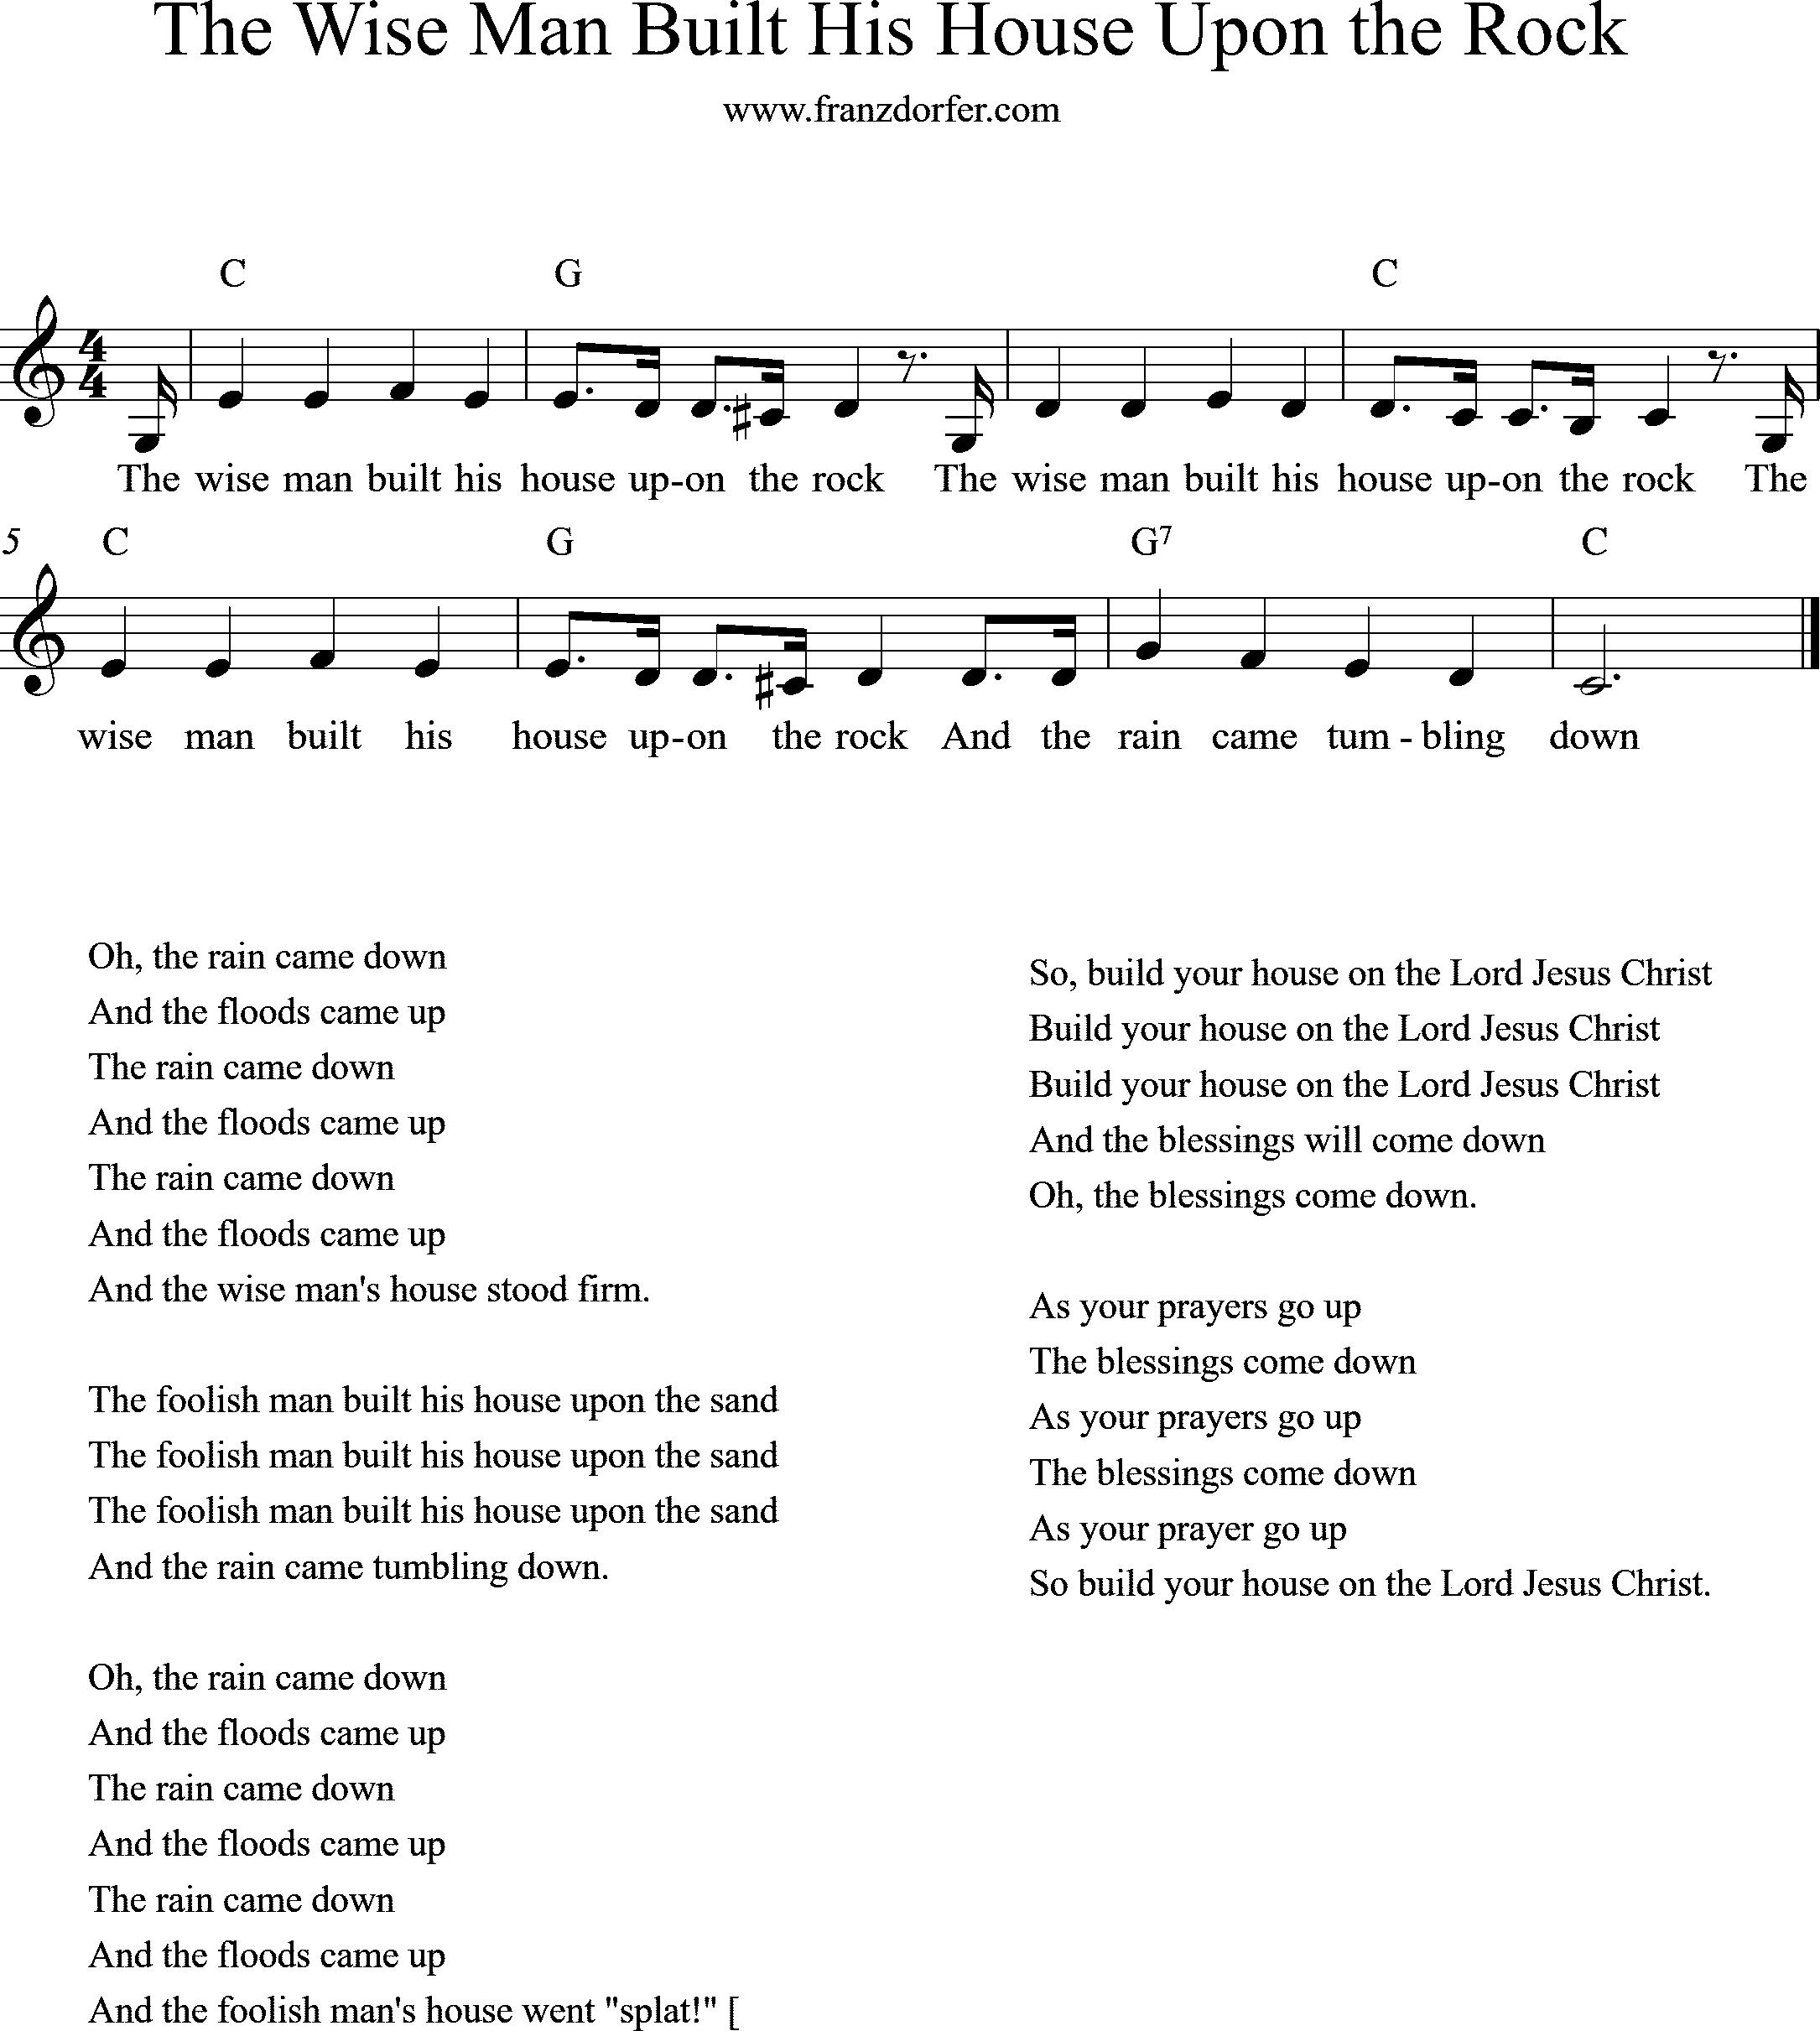 sheetmusic, The wise man